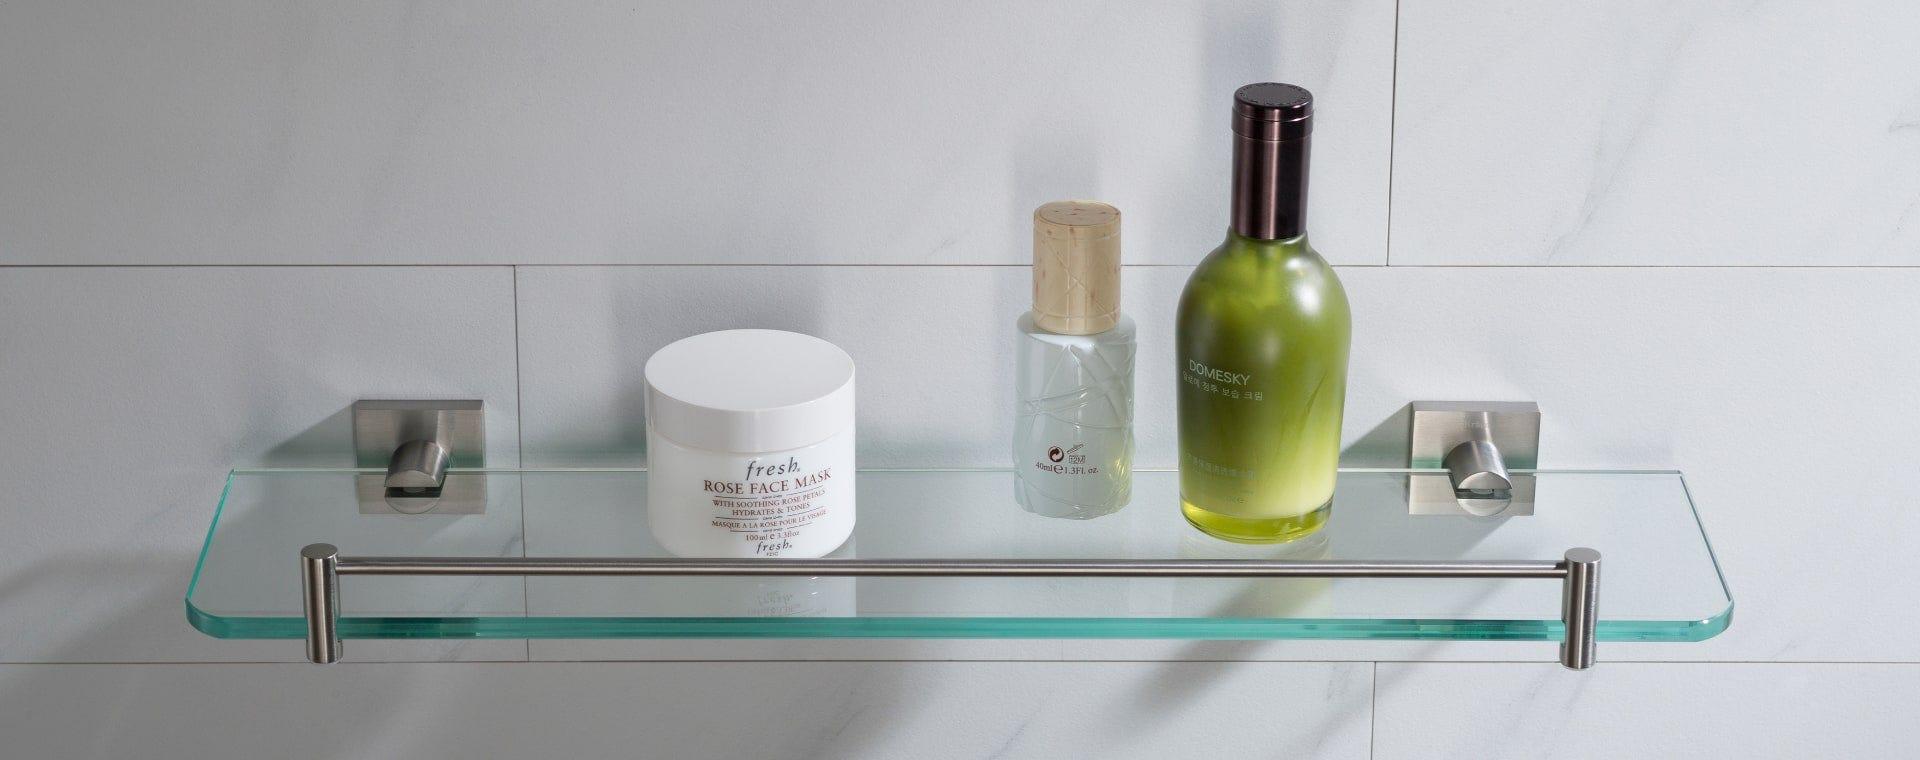 Kraus USA | Bathroom Shelves | Bathroom Accessories